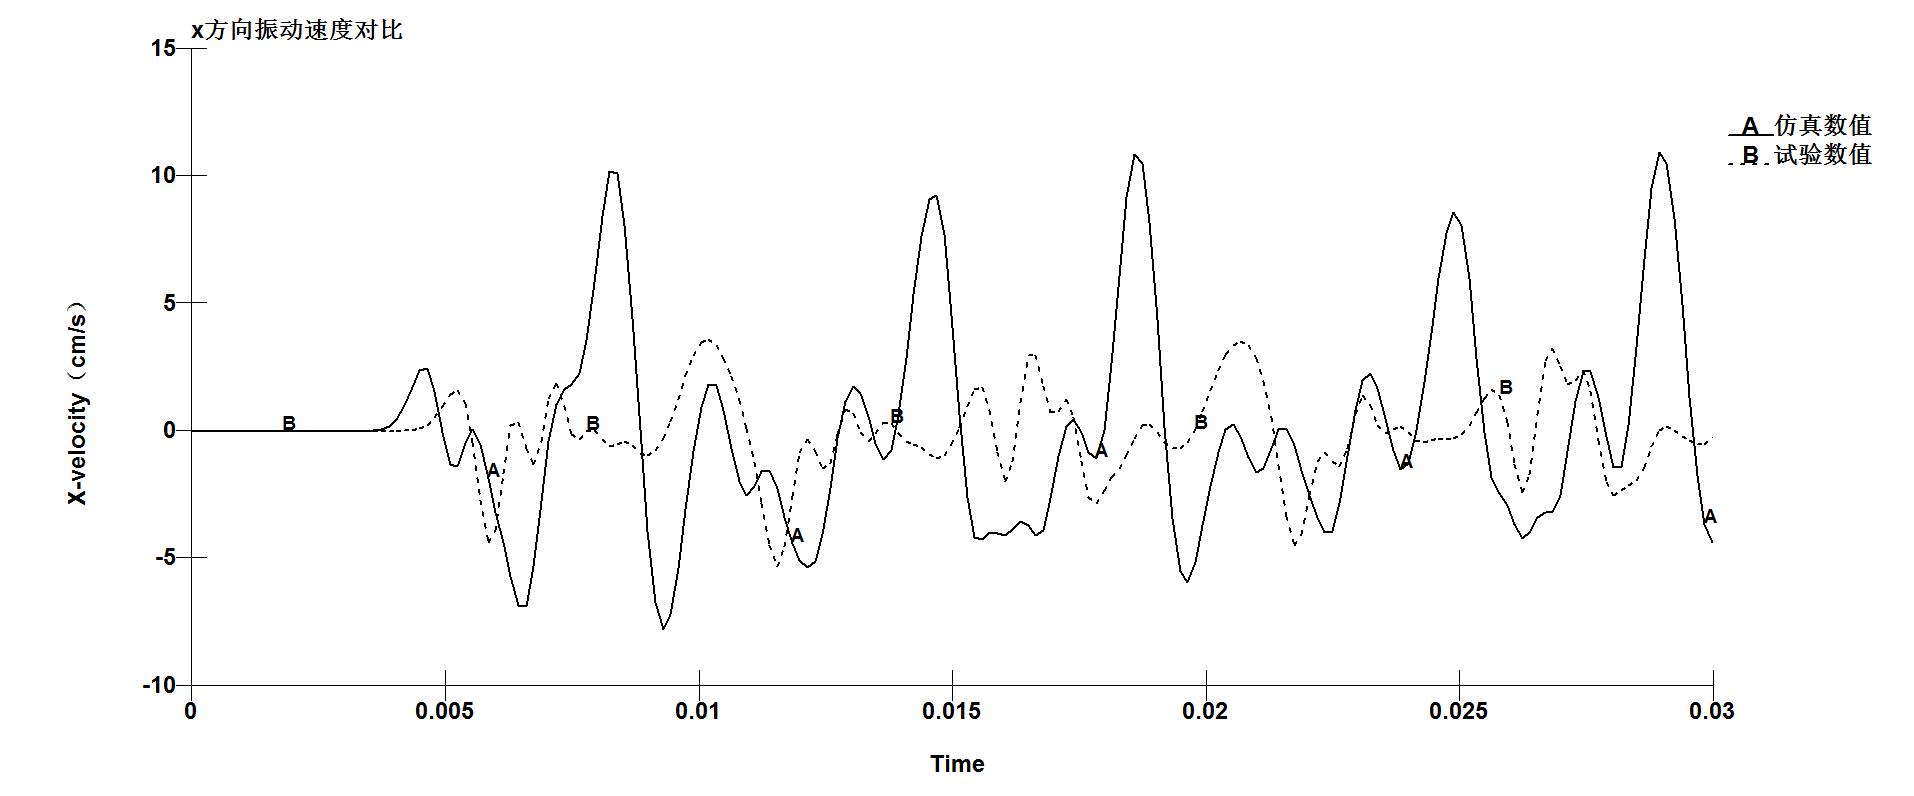 x方向振动速度对比.png